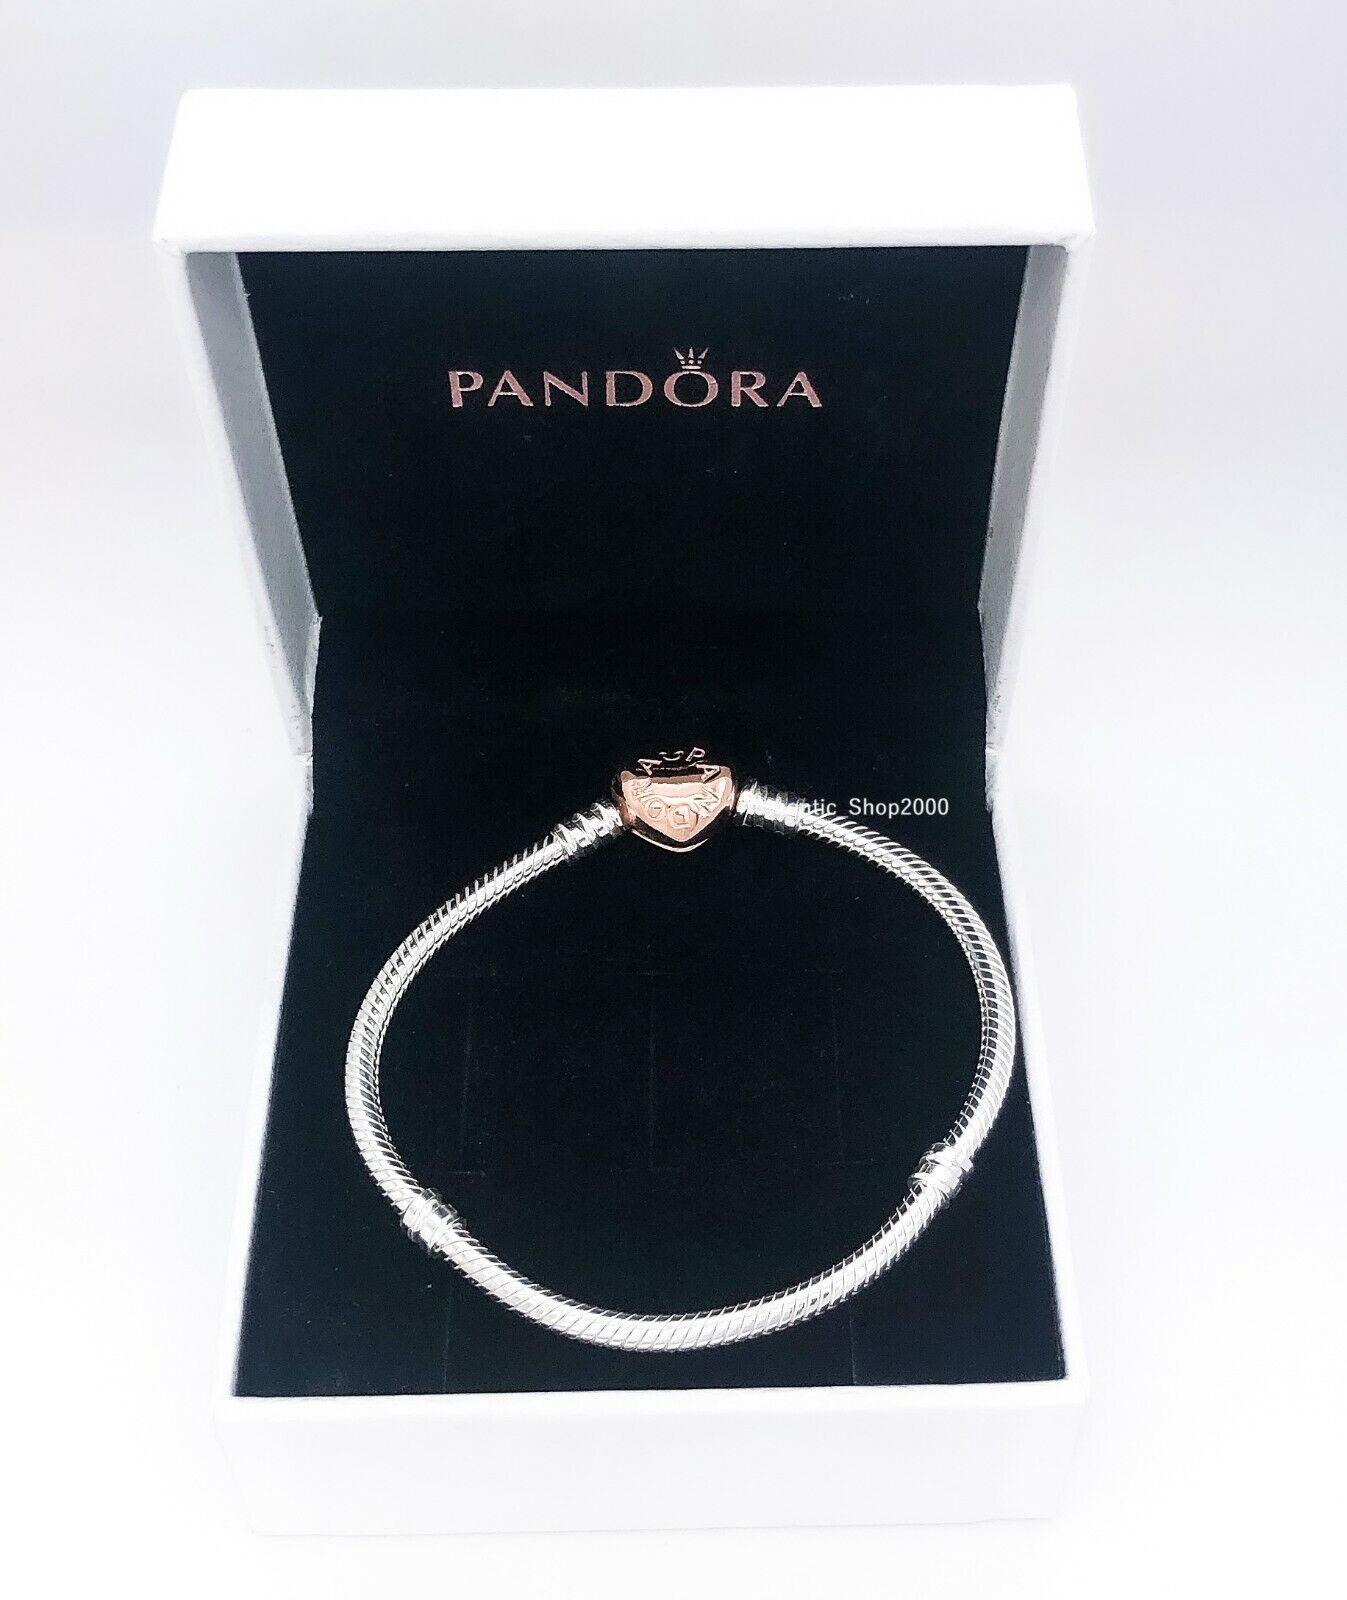 A Rose 925 Sterling Silver Bracelet, Floral Bracelet, Charm Bracelet, Rosa rugosa Bracelet, Valentine/'s Day Gift, Handmade Jewelry